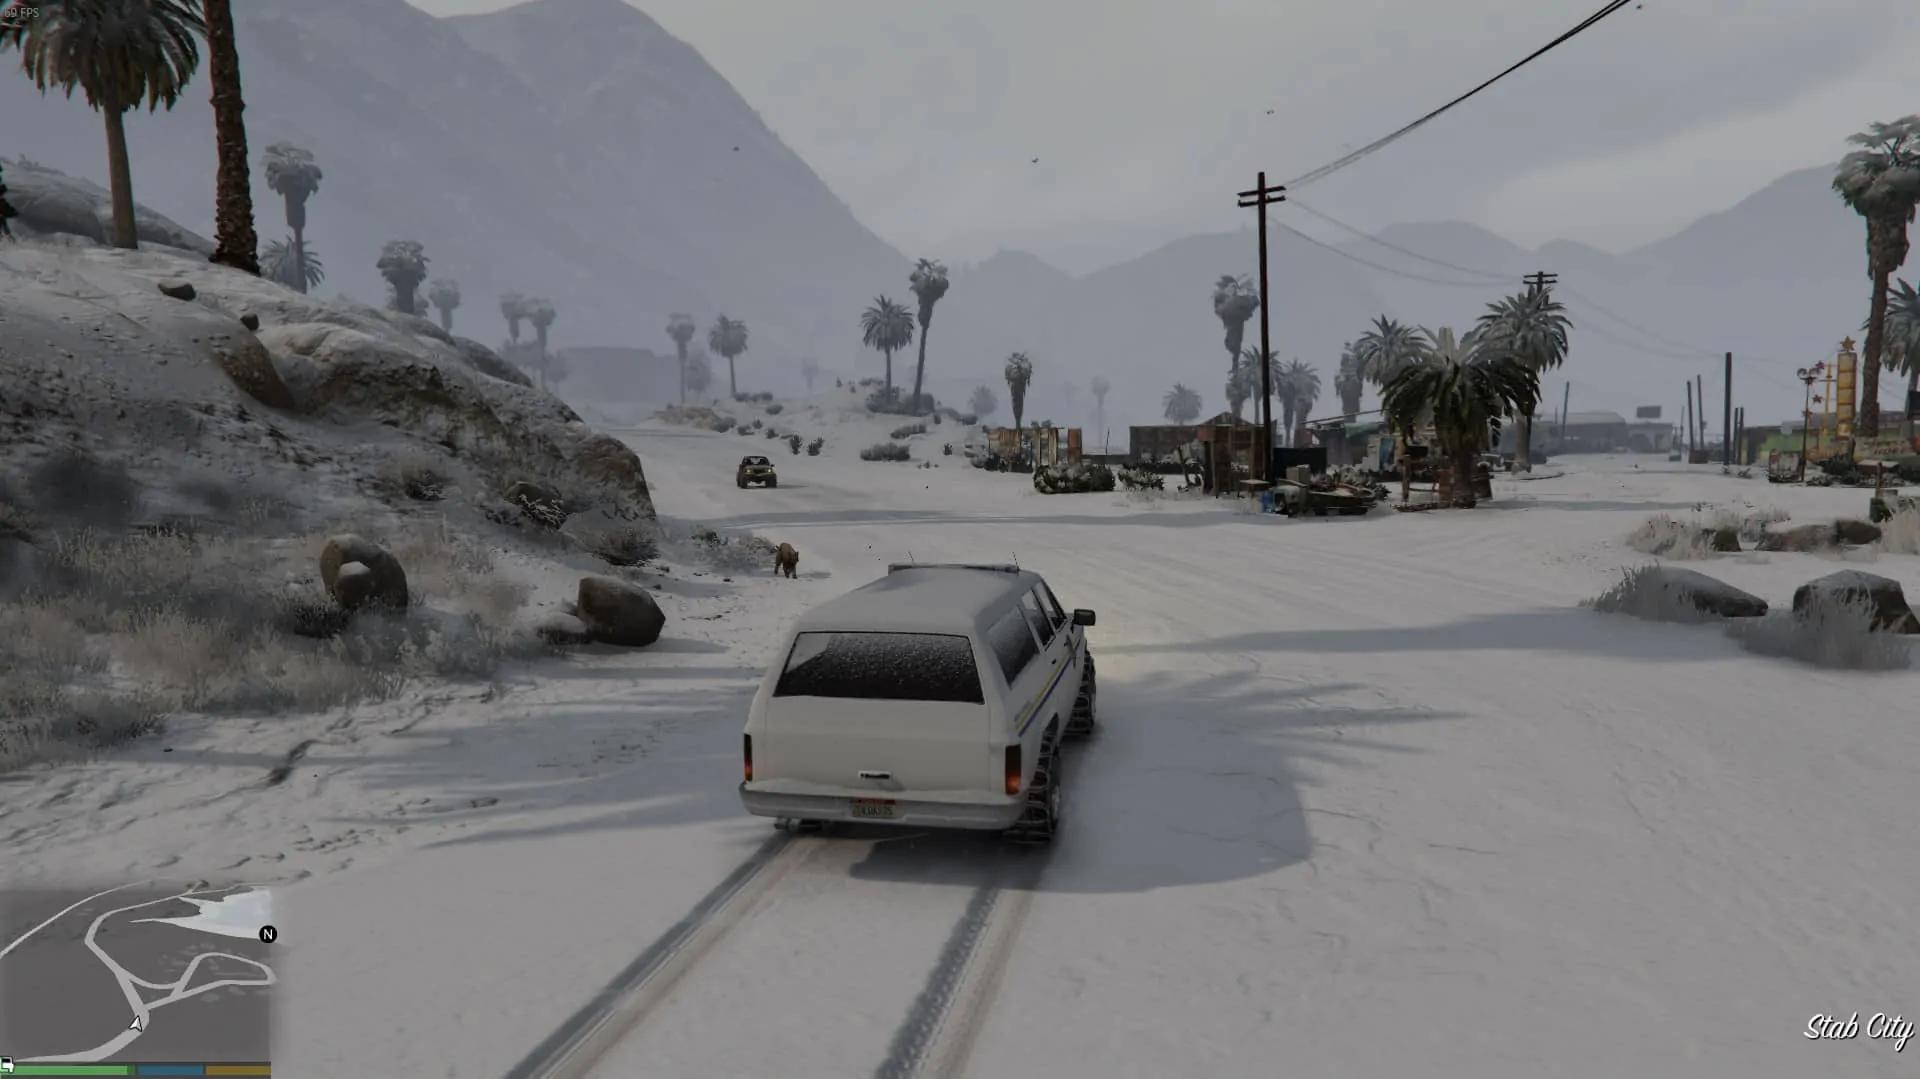 GTA Online's Snow Modded Into Single Player - GTA BOOM